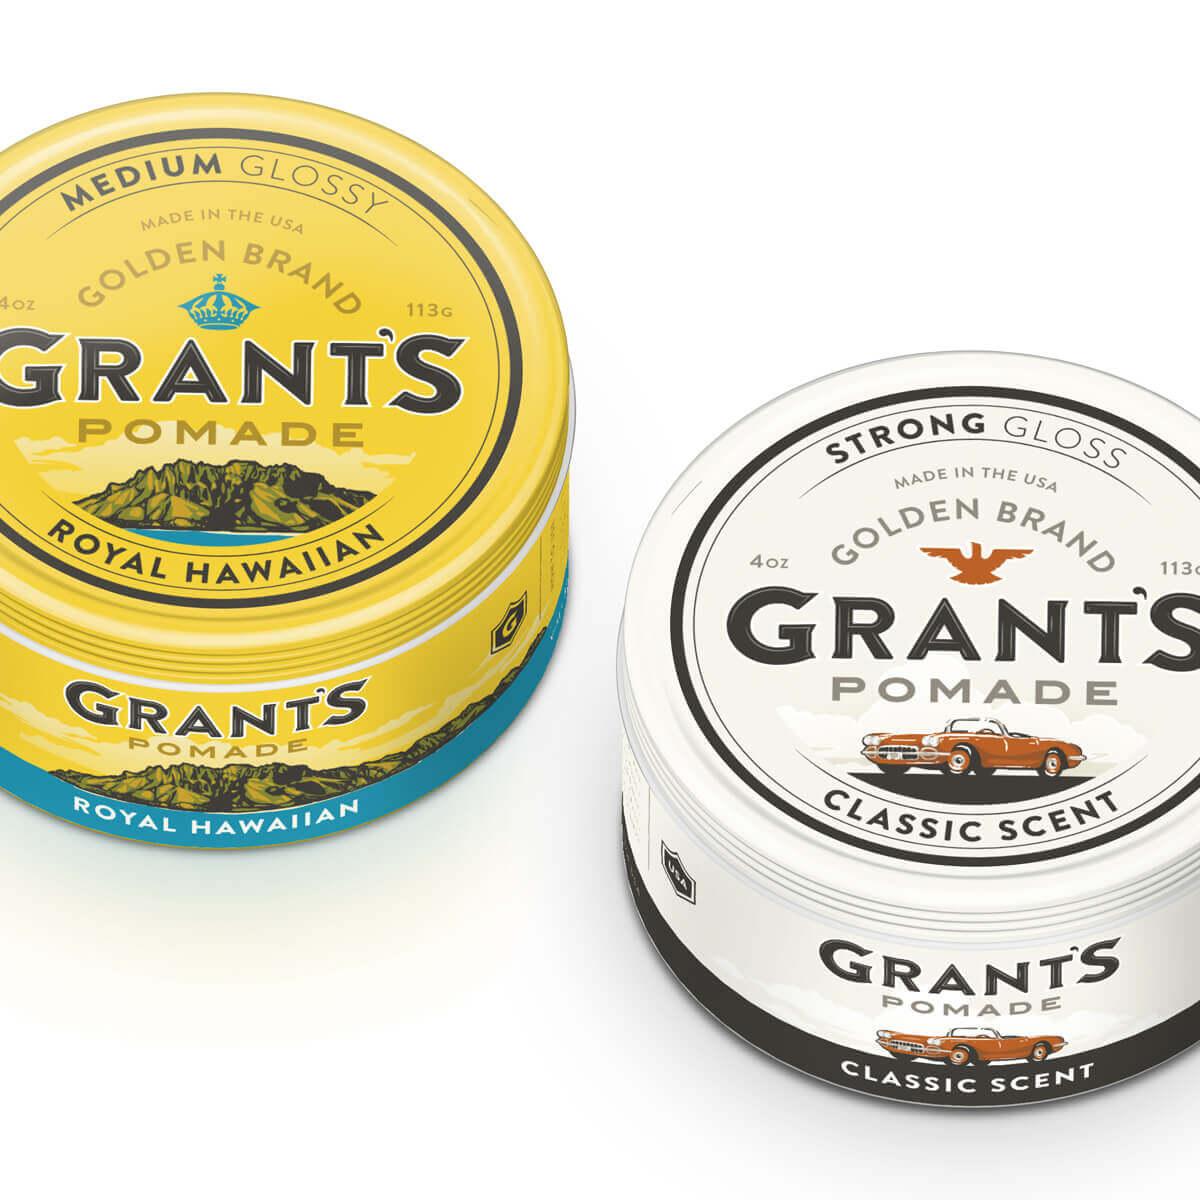 Pomade Branding & Packaging Hero Image